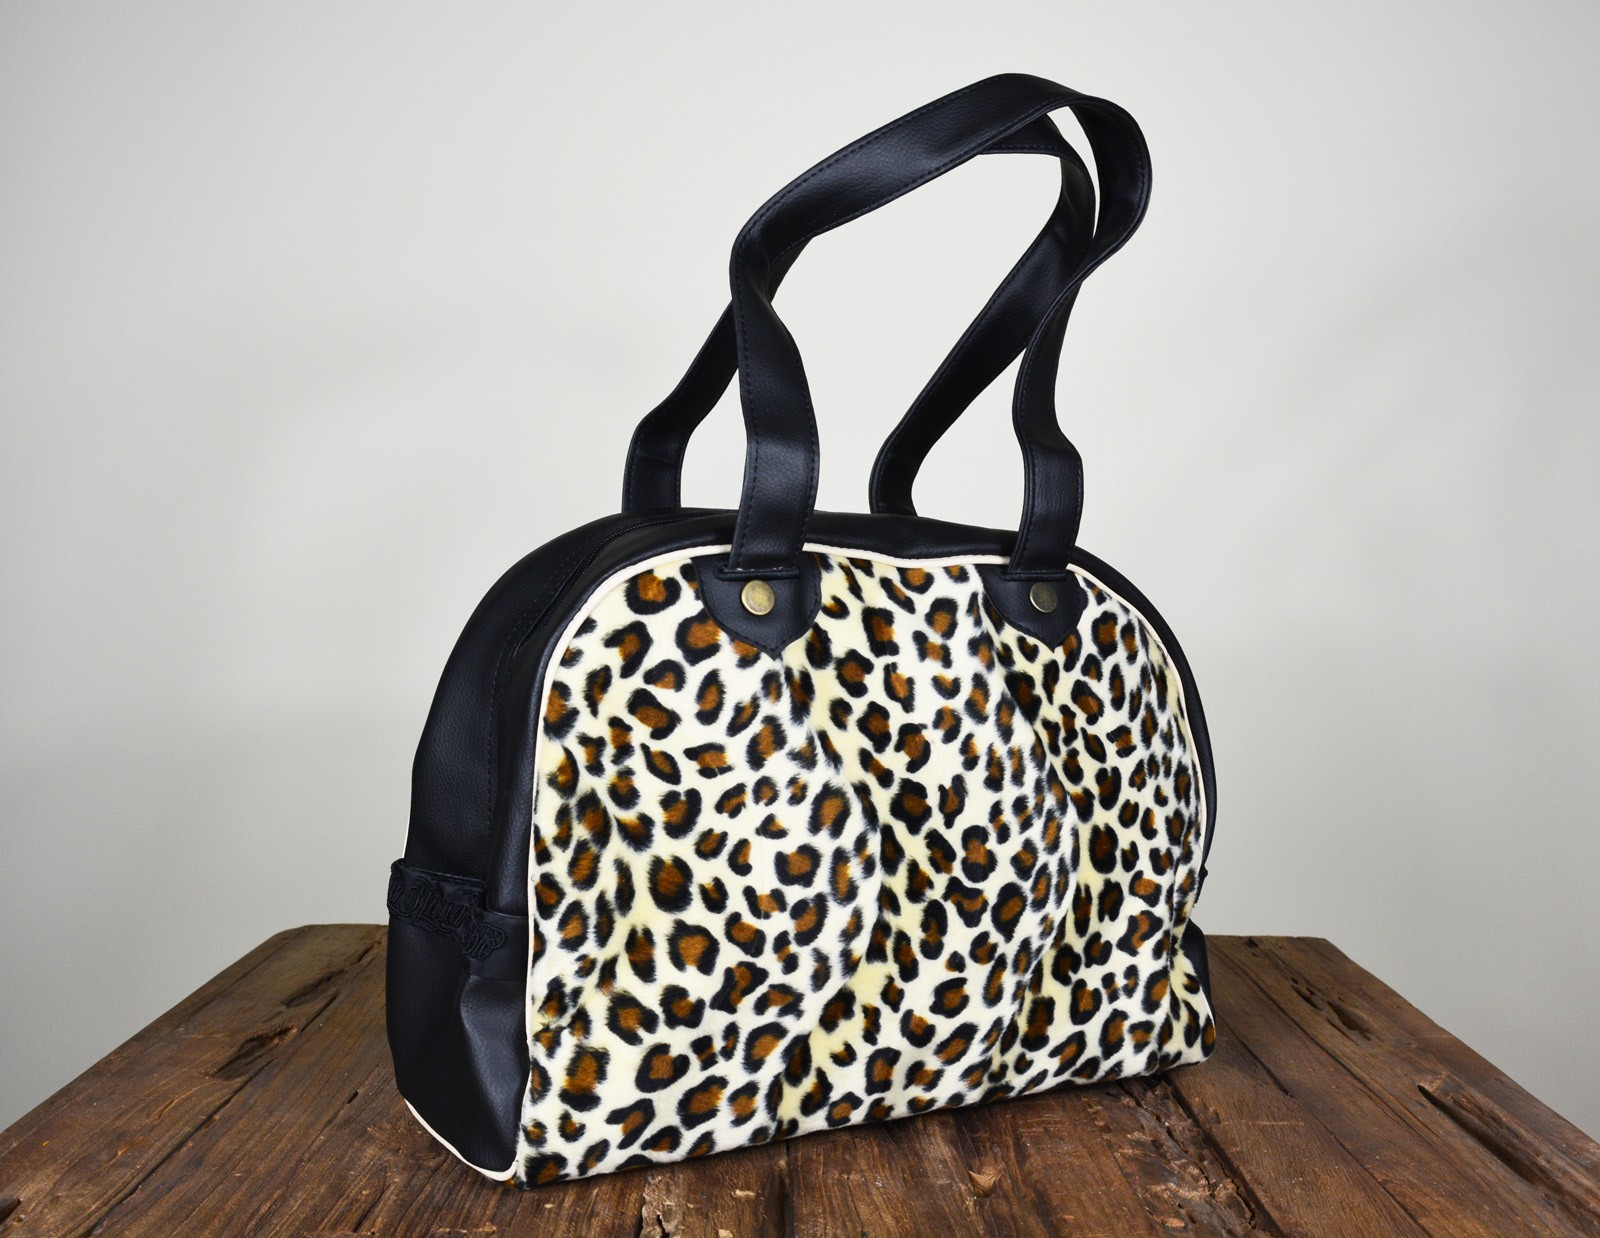 La Marca Del Diablo - Leopard Bowling Bag